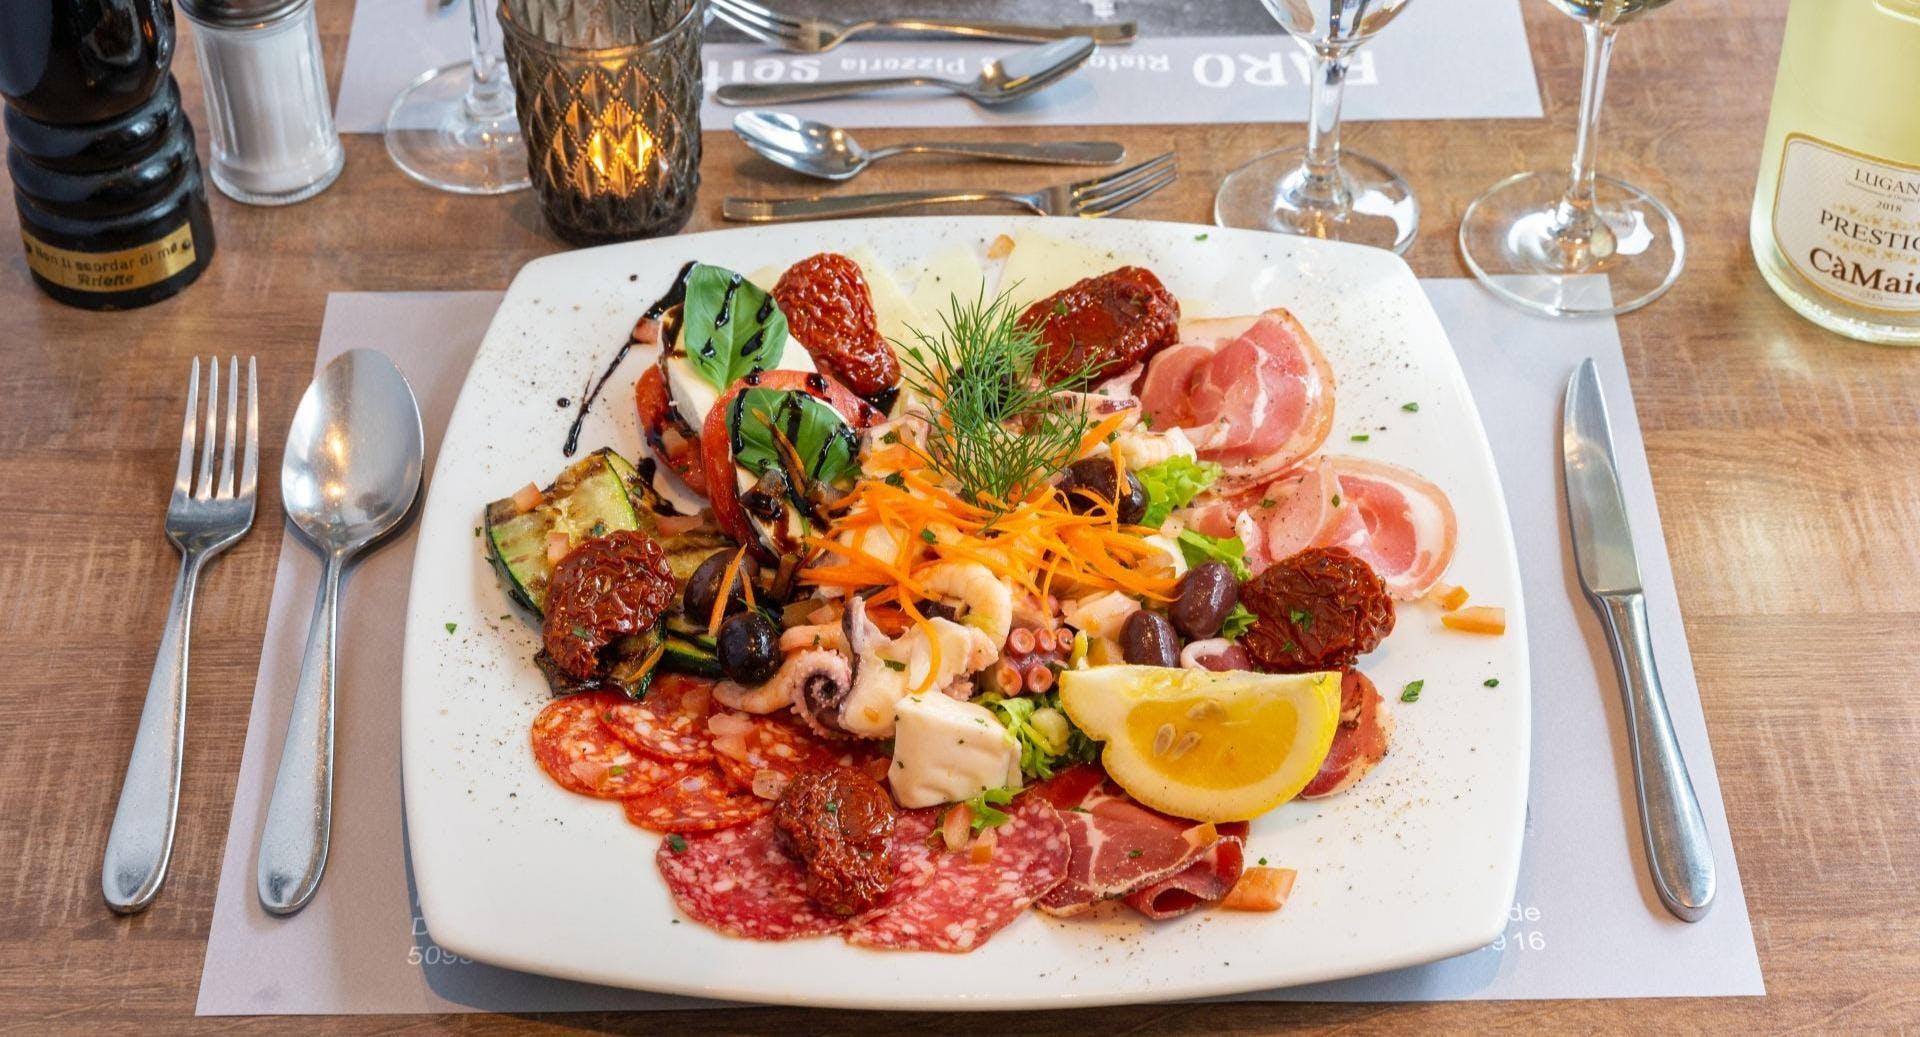 Faro Italienisches Restaurant Cologne image 2